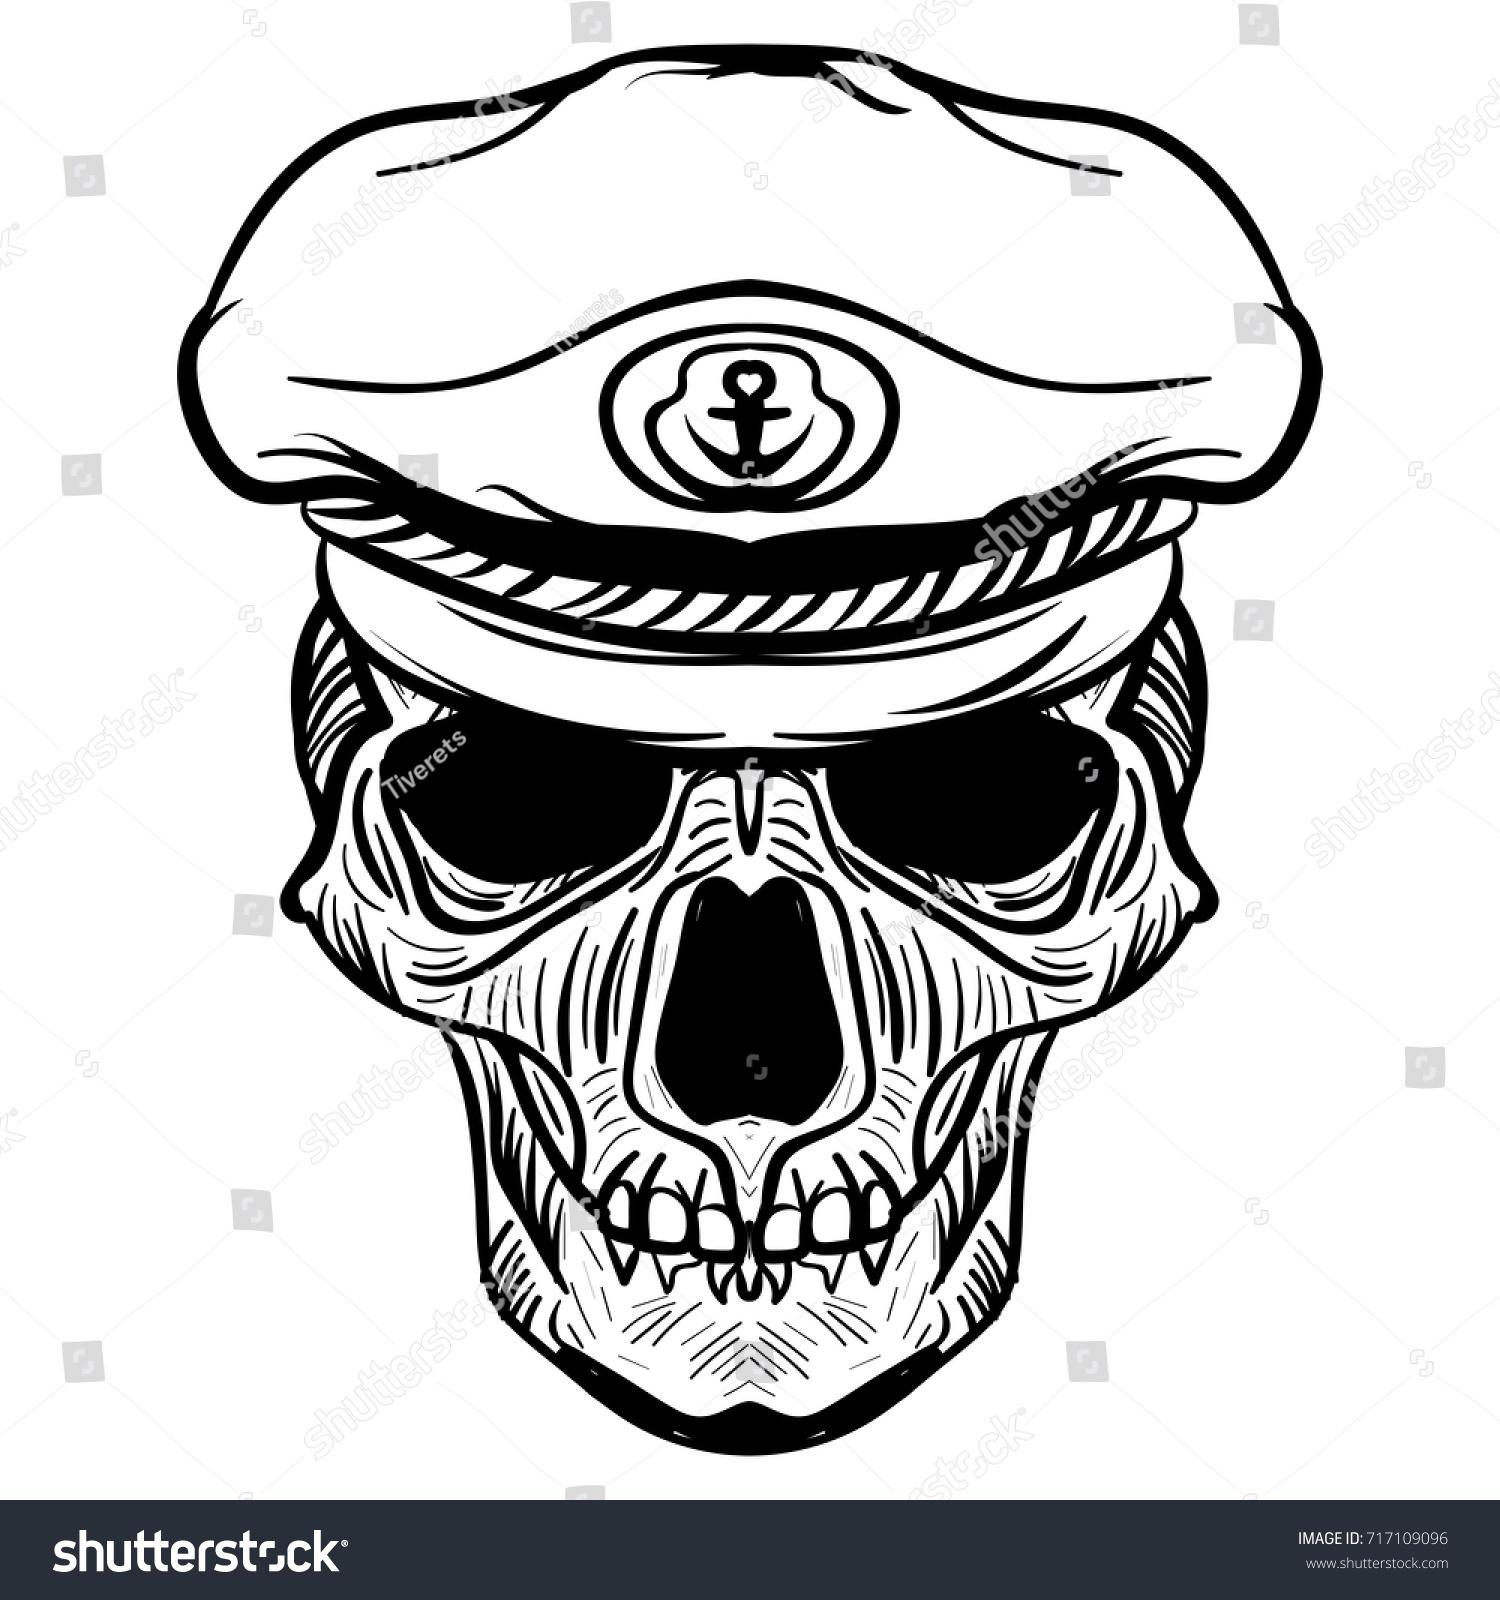 Vintage Hat Tattoos: Vintage Naval Skull Drawing Captain Hat Stock Vector